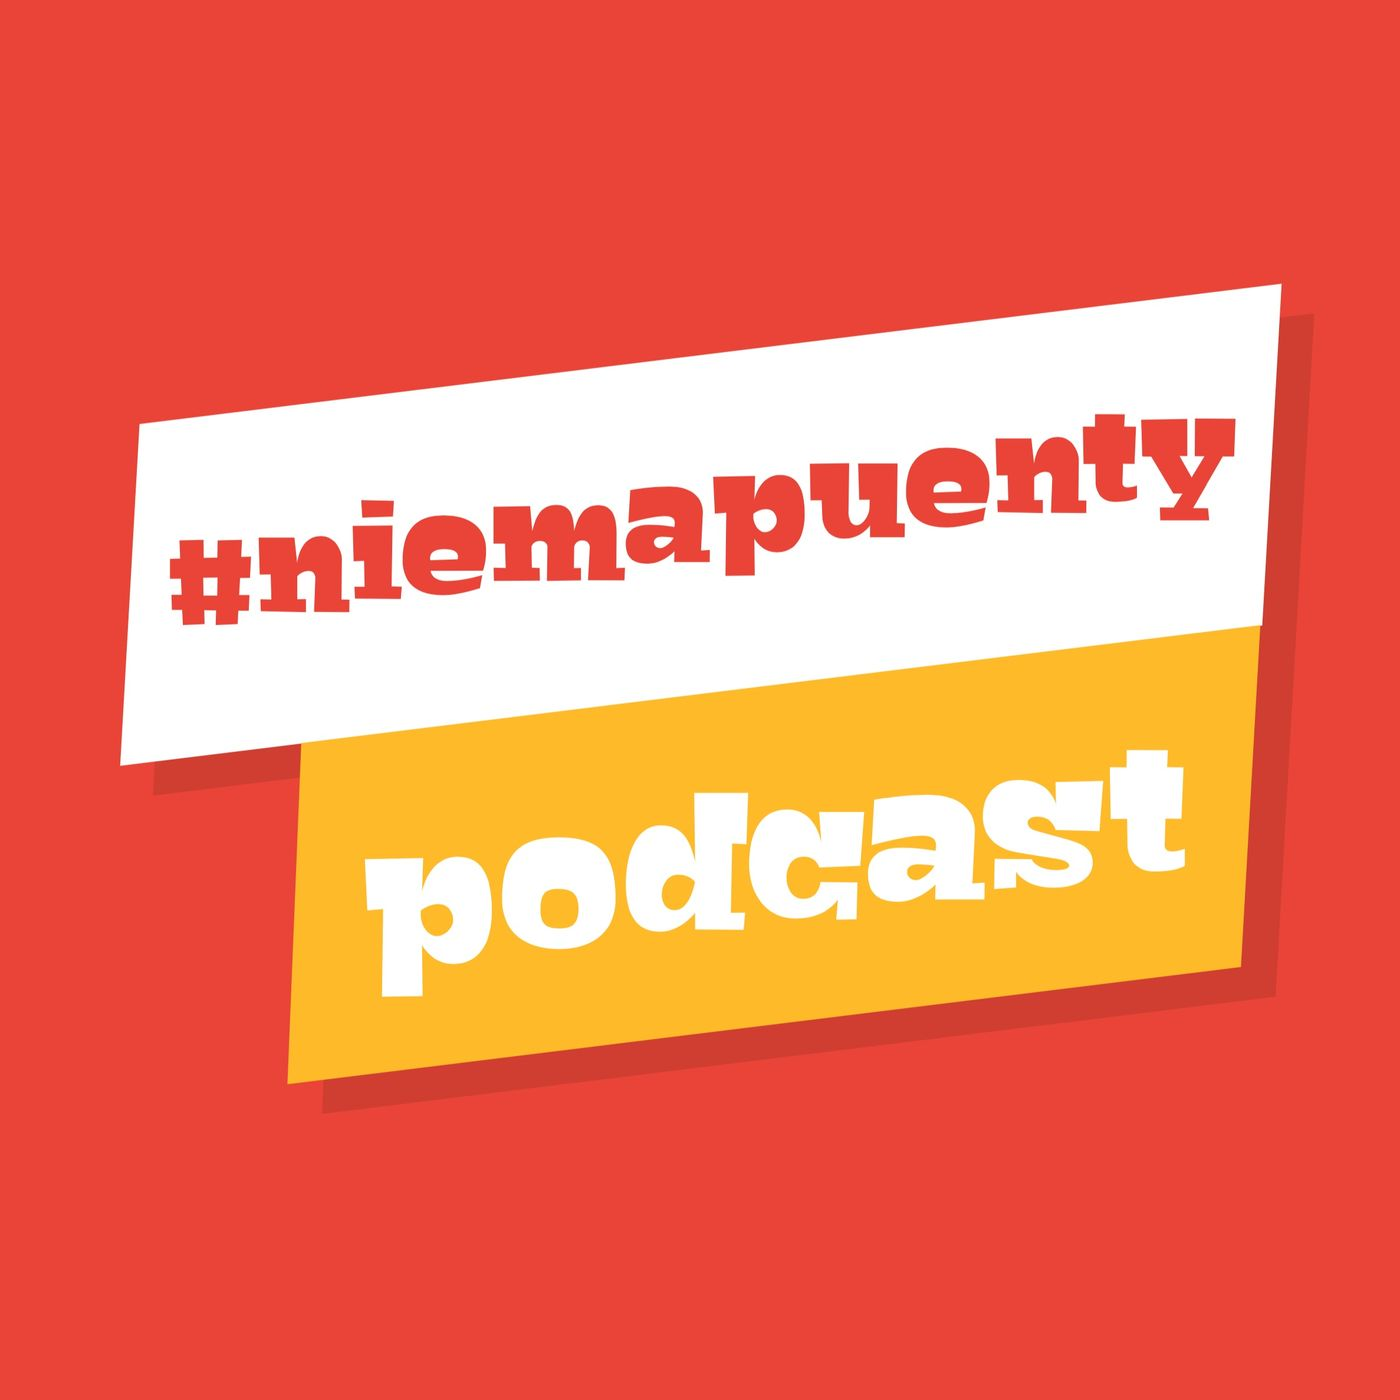 18 #niemapuenty